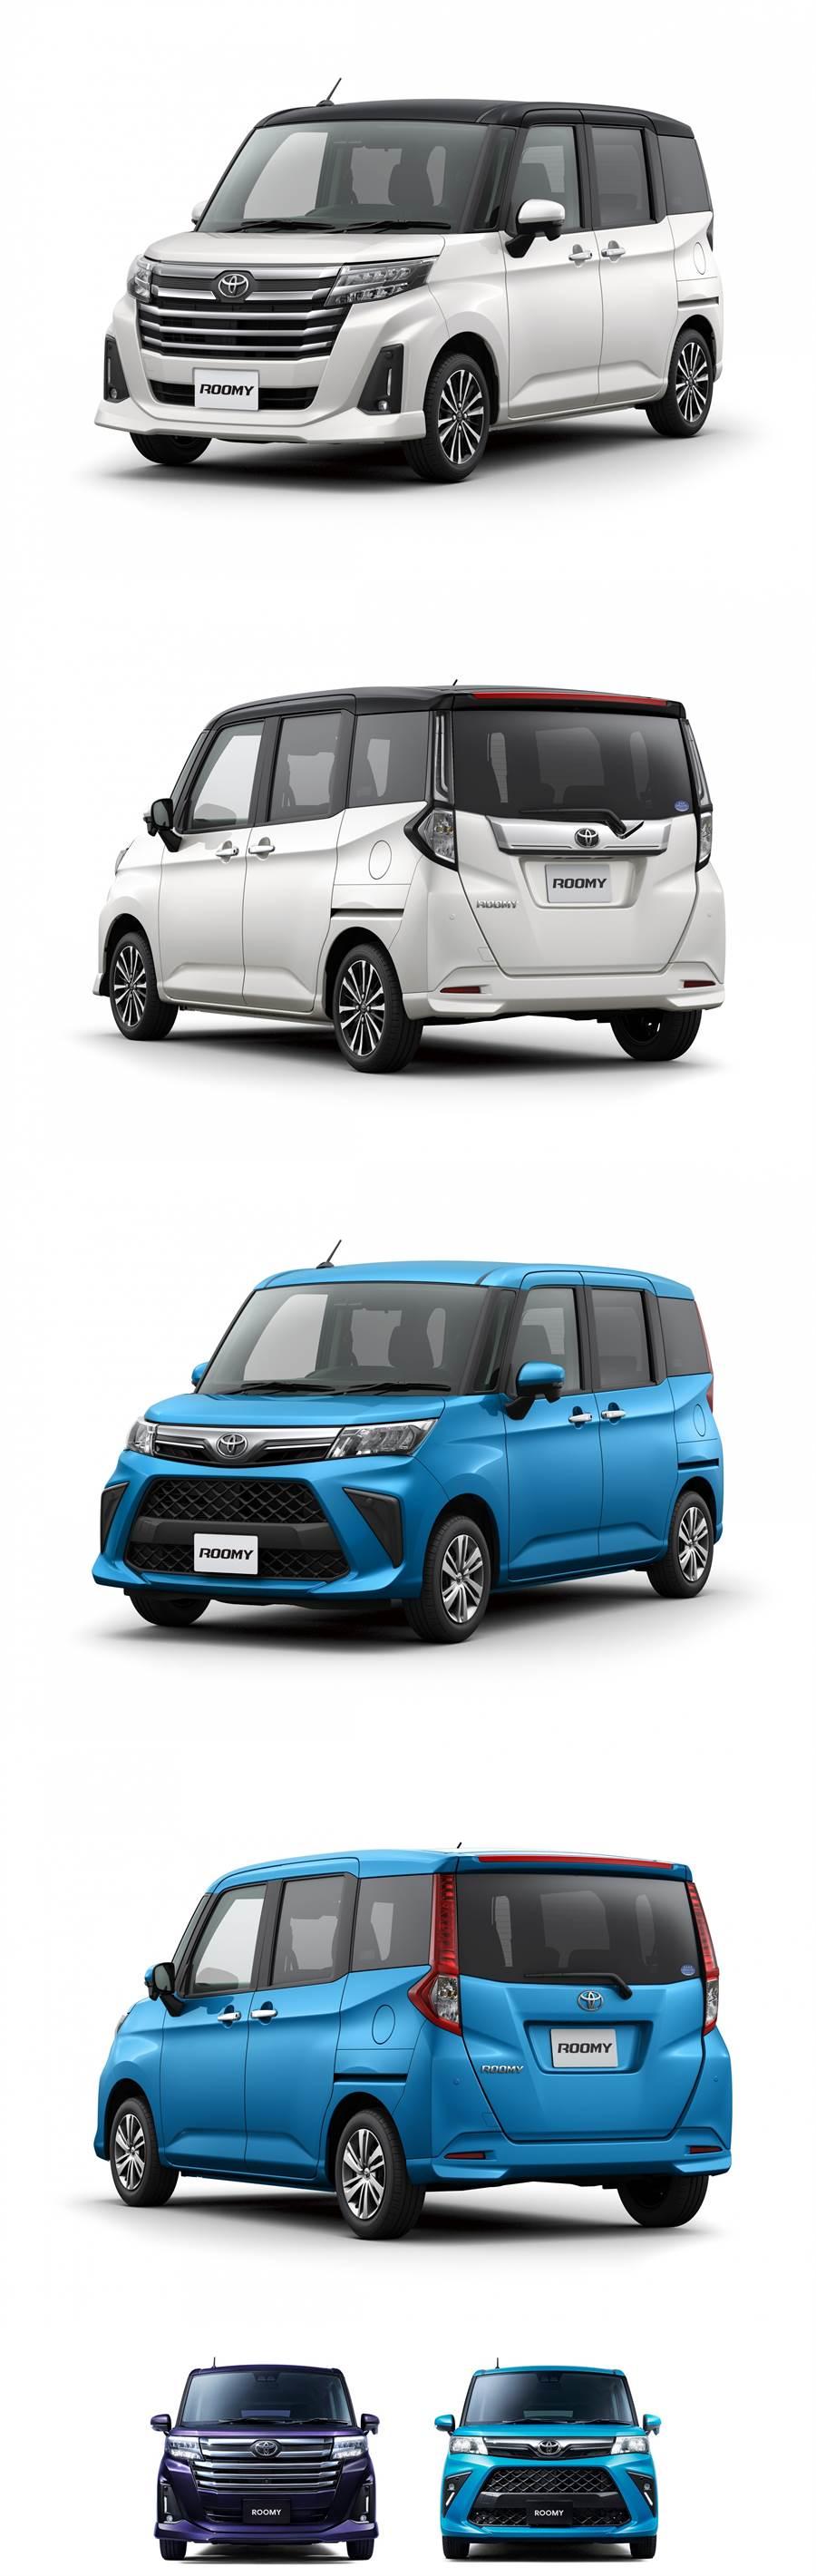 Smart Assist 安全系統進化、內裝質感向上,Daihatsu Thor/Toyota Roomy 小改款正式發表